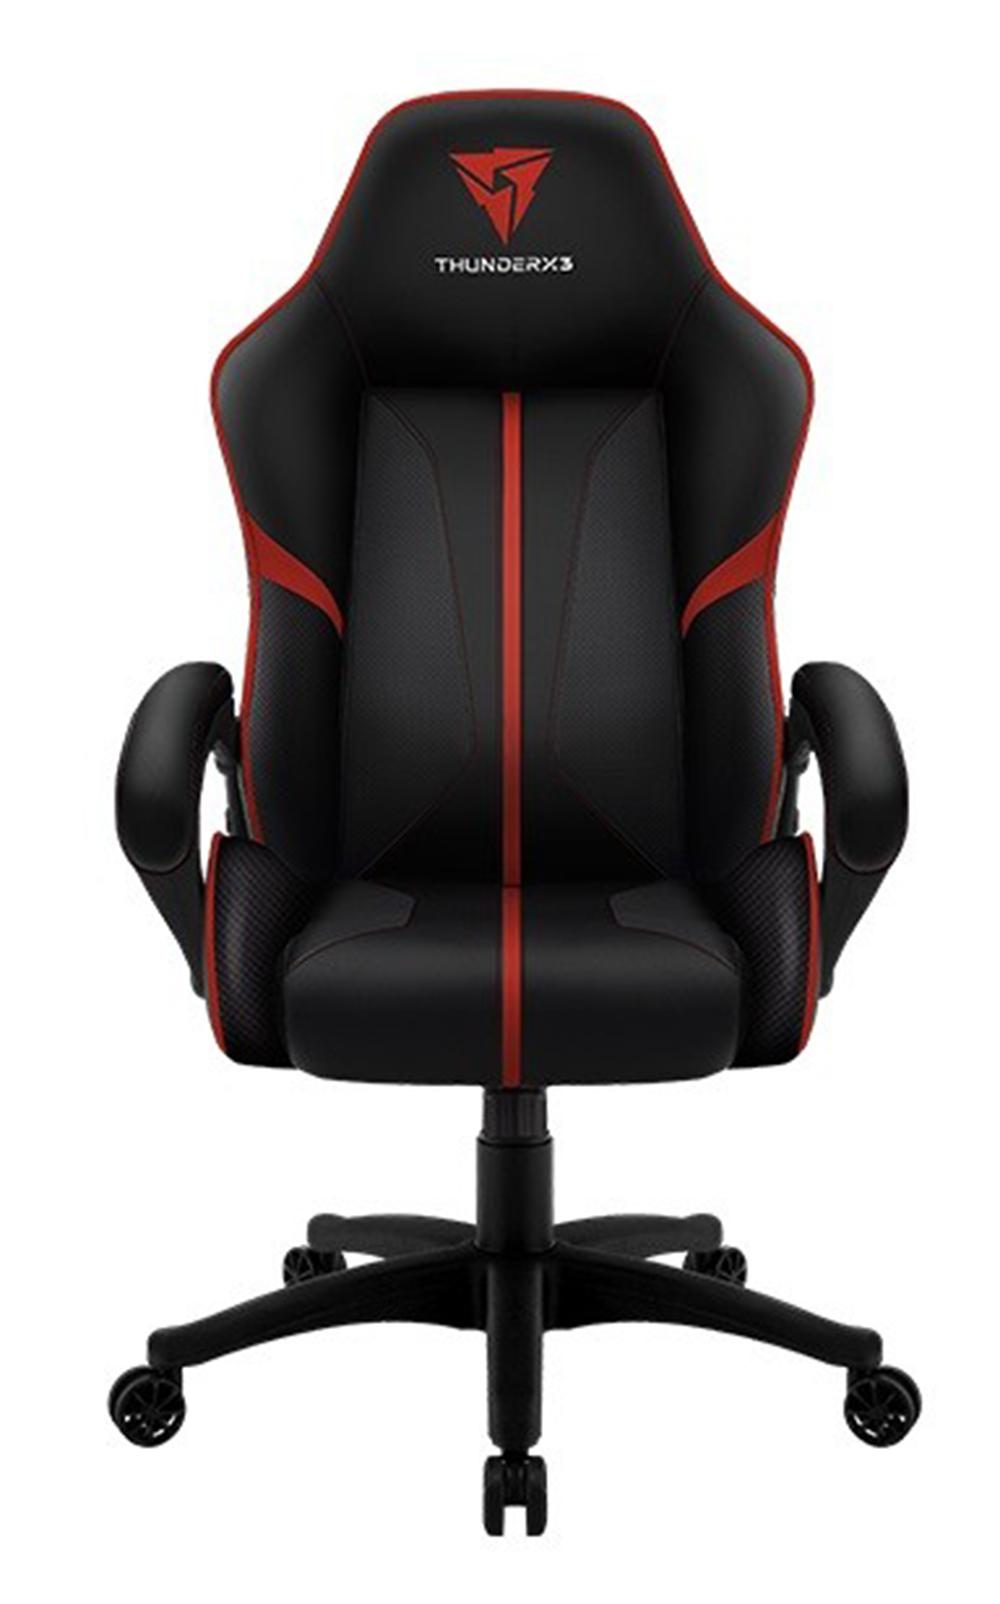 ThunderX3 BC1 Series Gaming Chair - Black/Red